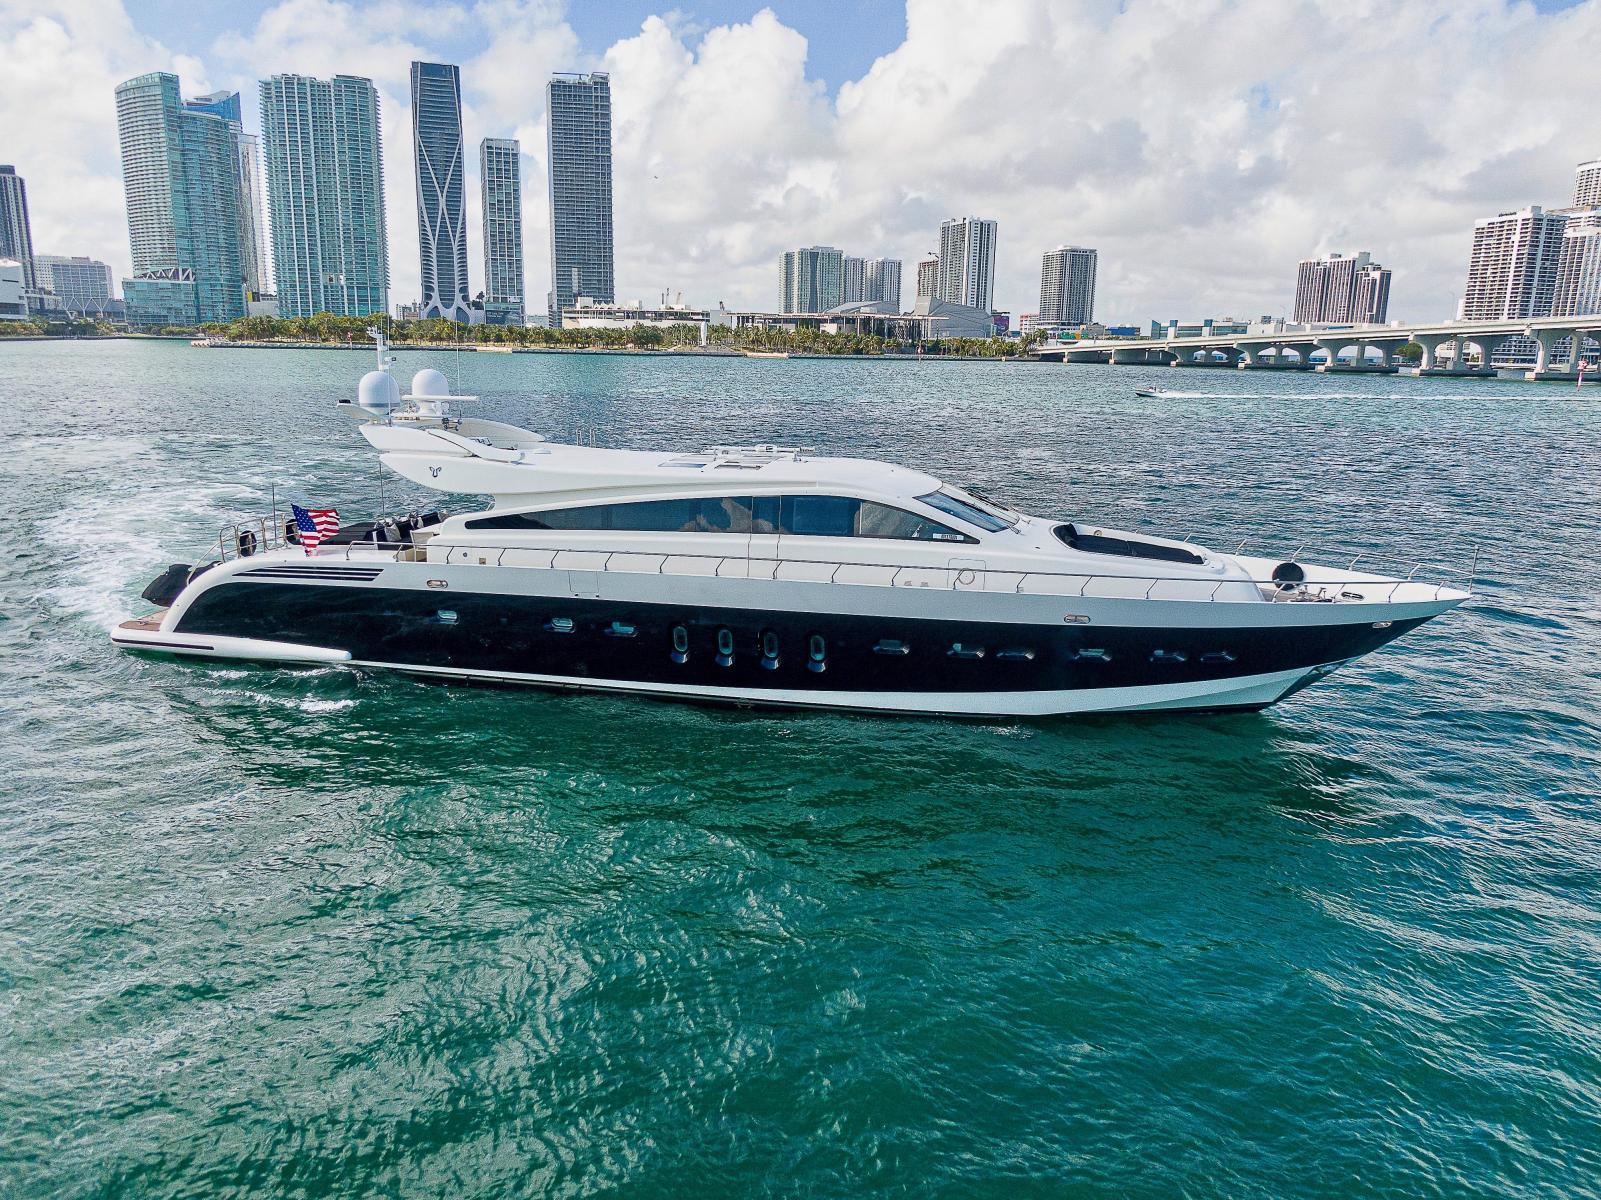 Port yachting - Friday